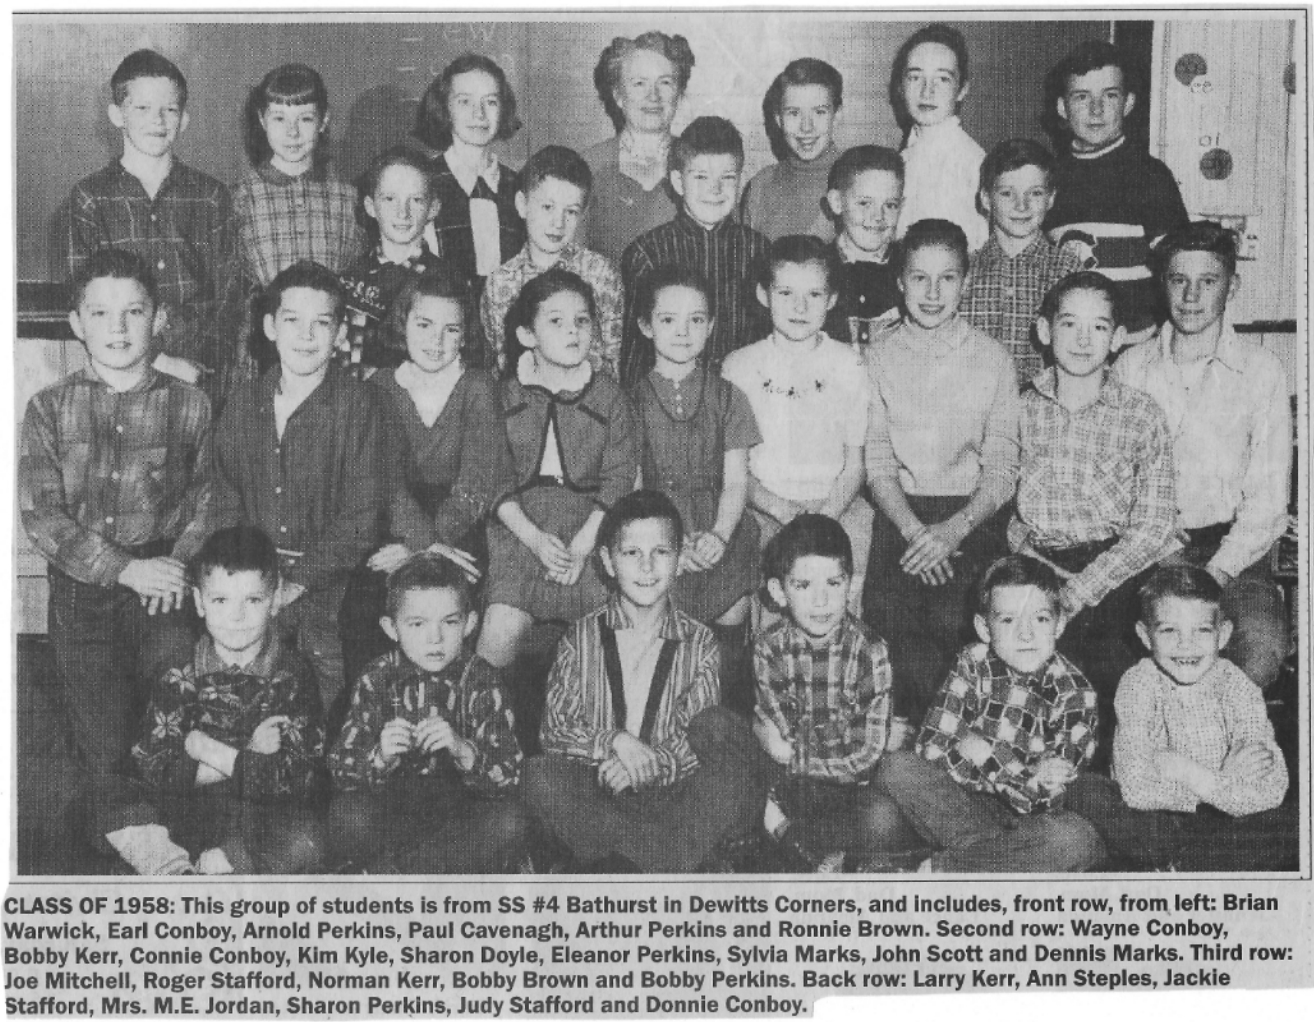 DeWitt's School photo